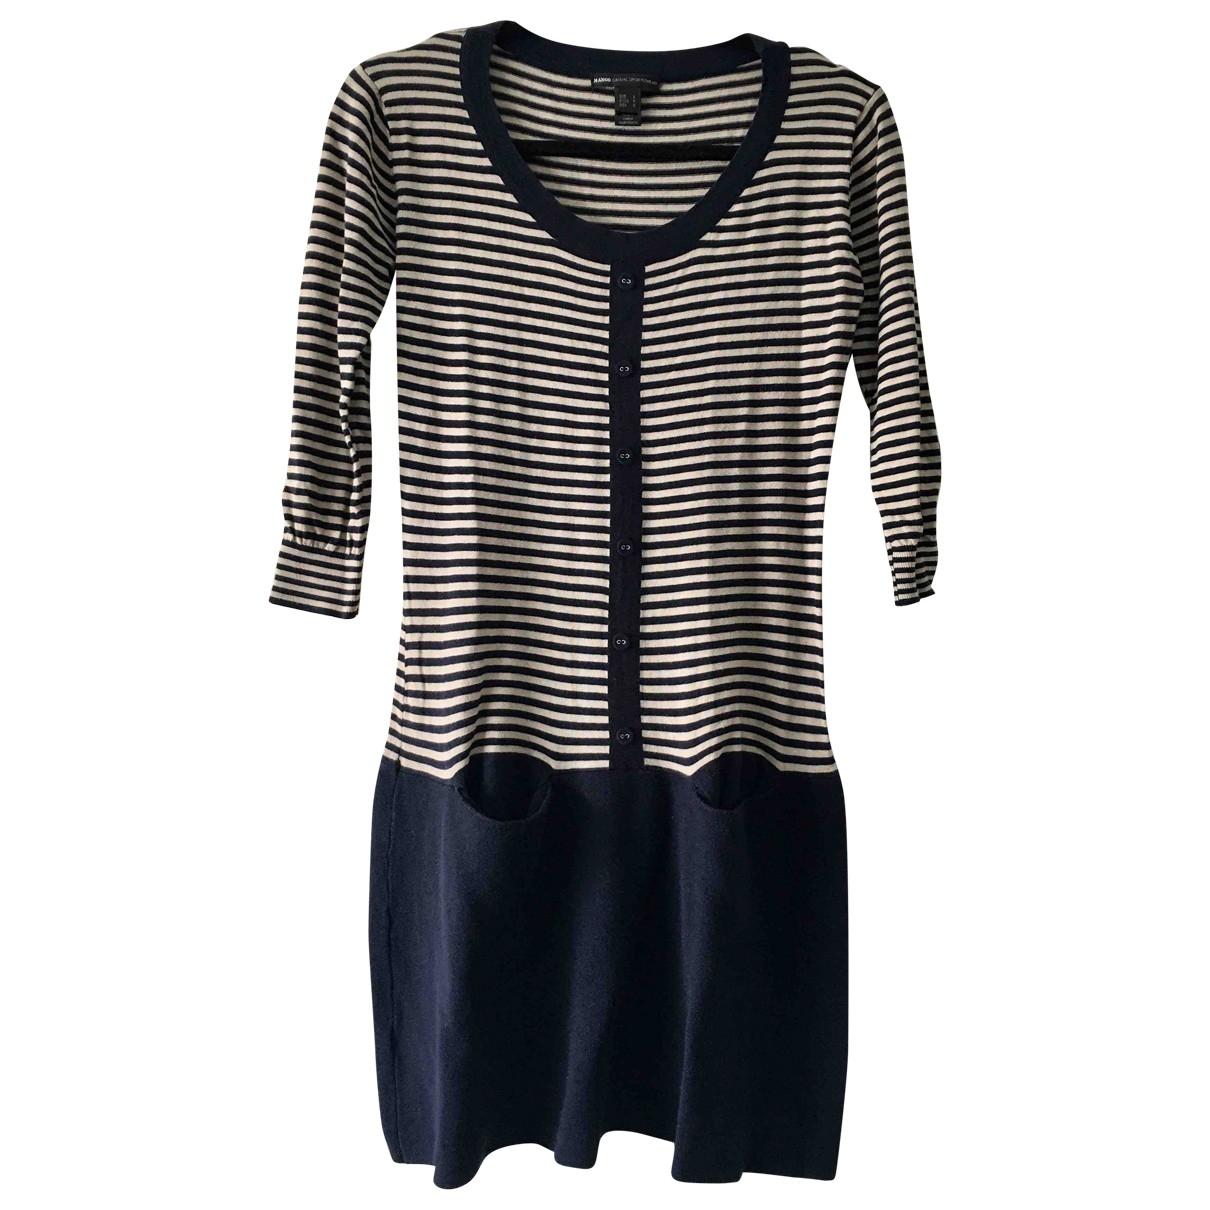 Mango \N Blue dress for Women L International